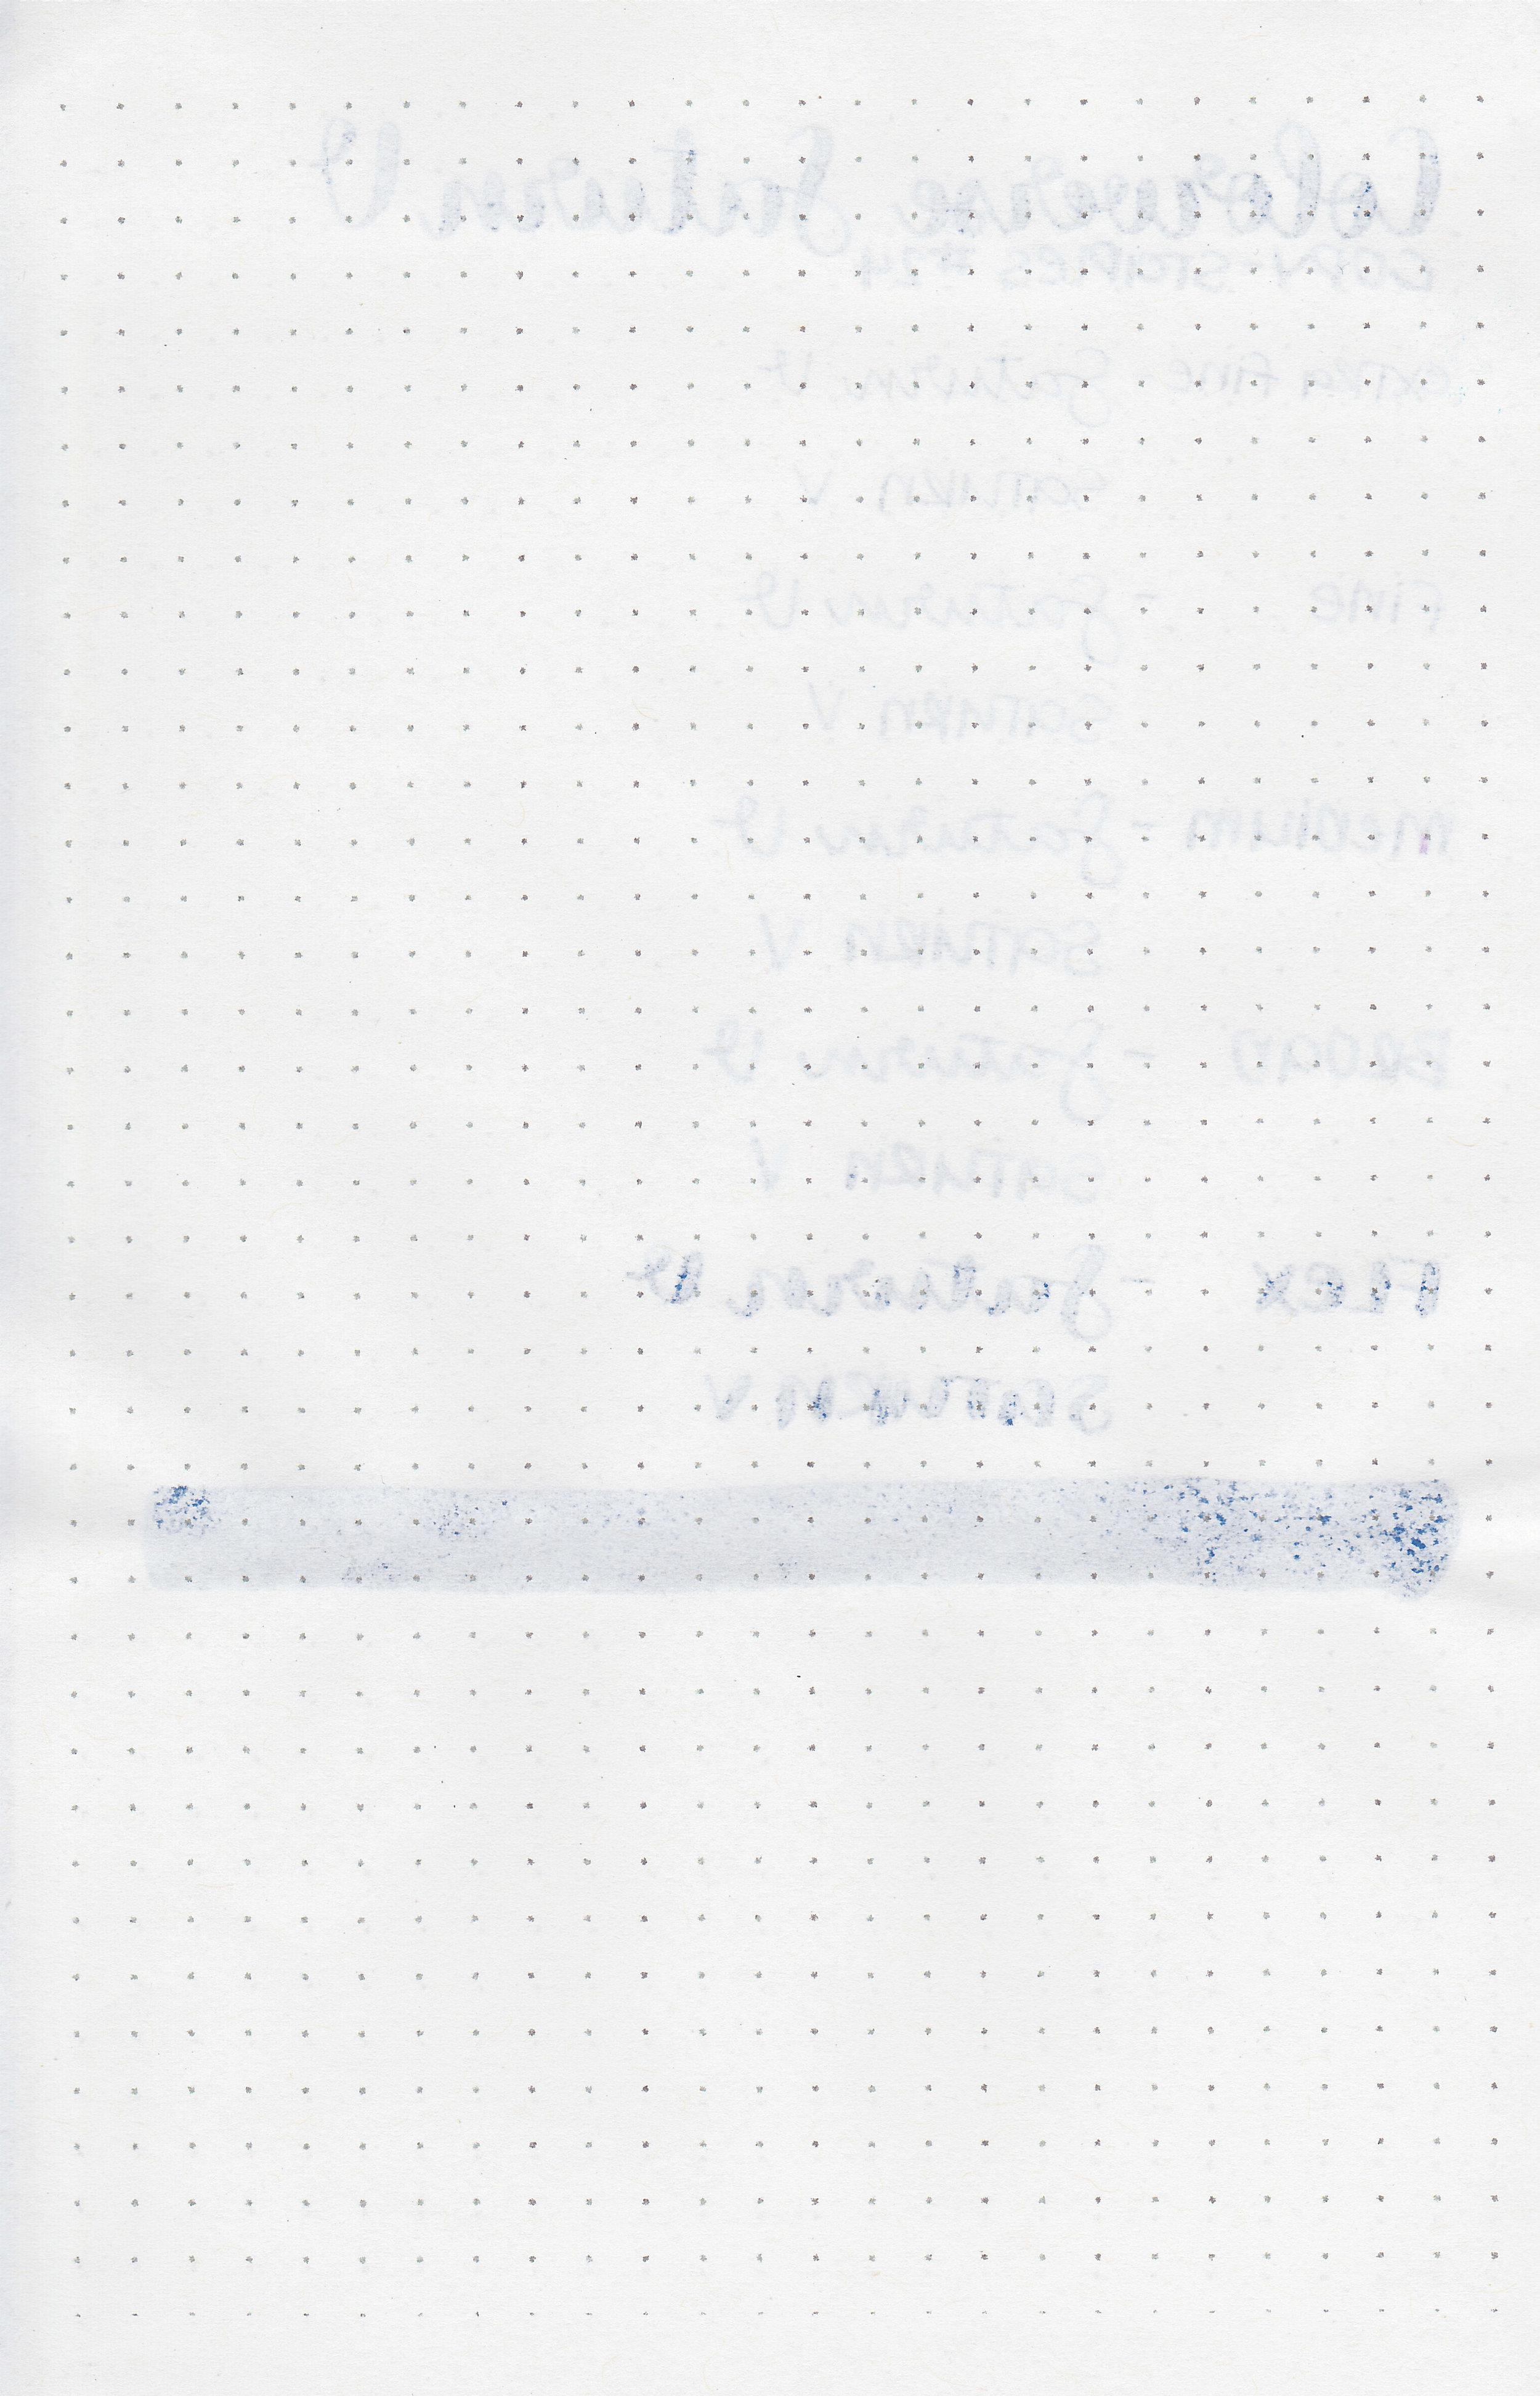 cv-saturn-v-13.jpg